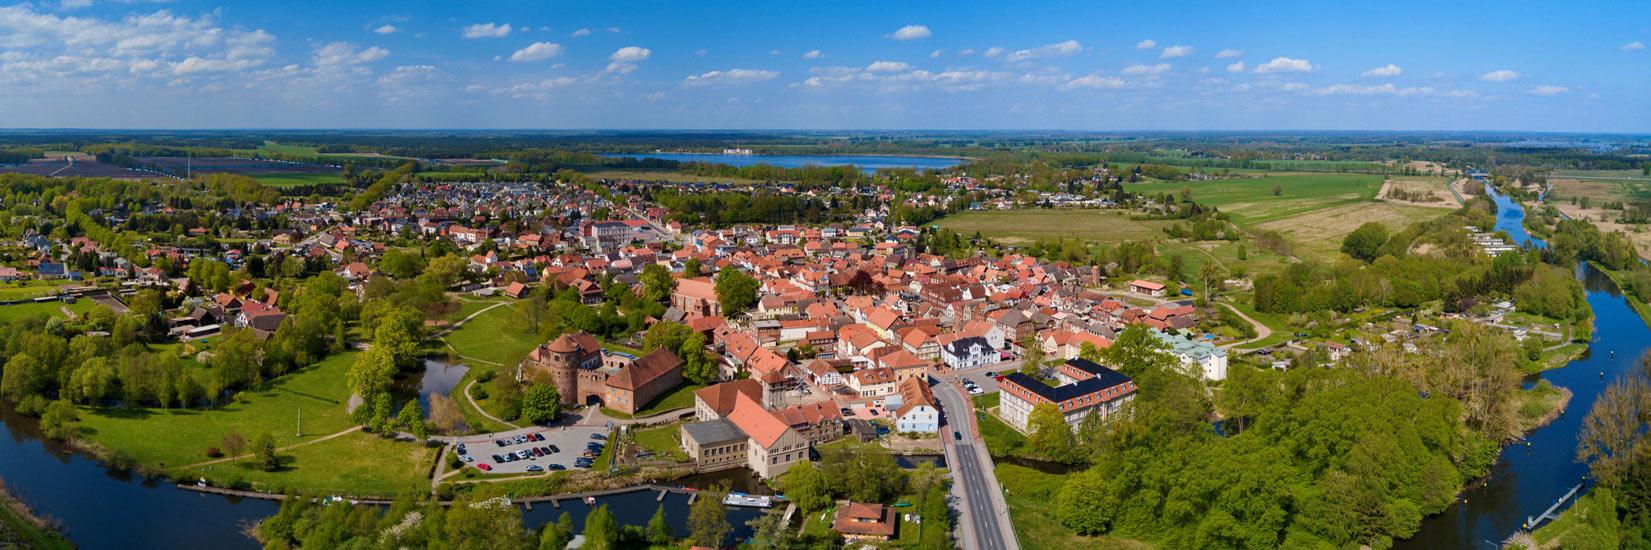 Luftbild - Stadtverwaltung Neustadt-Glewe